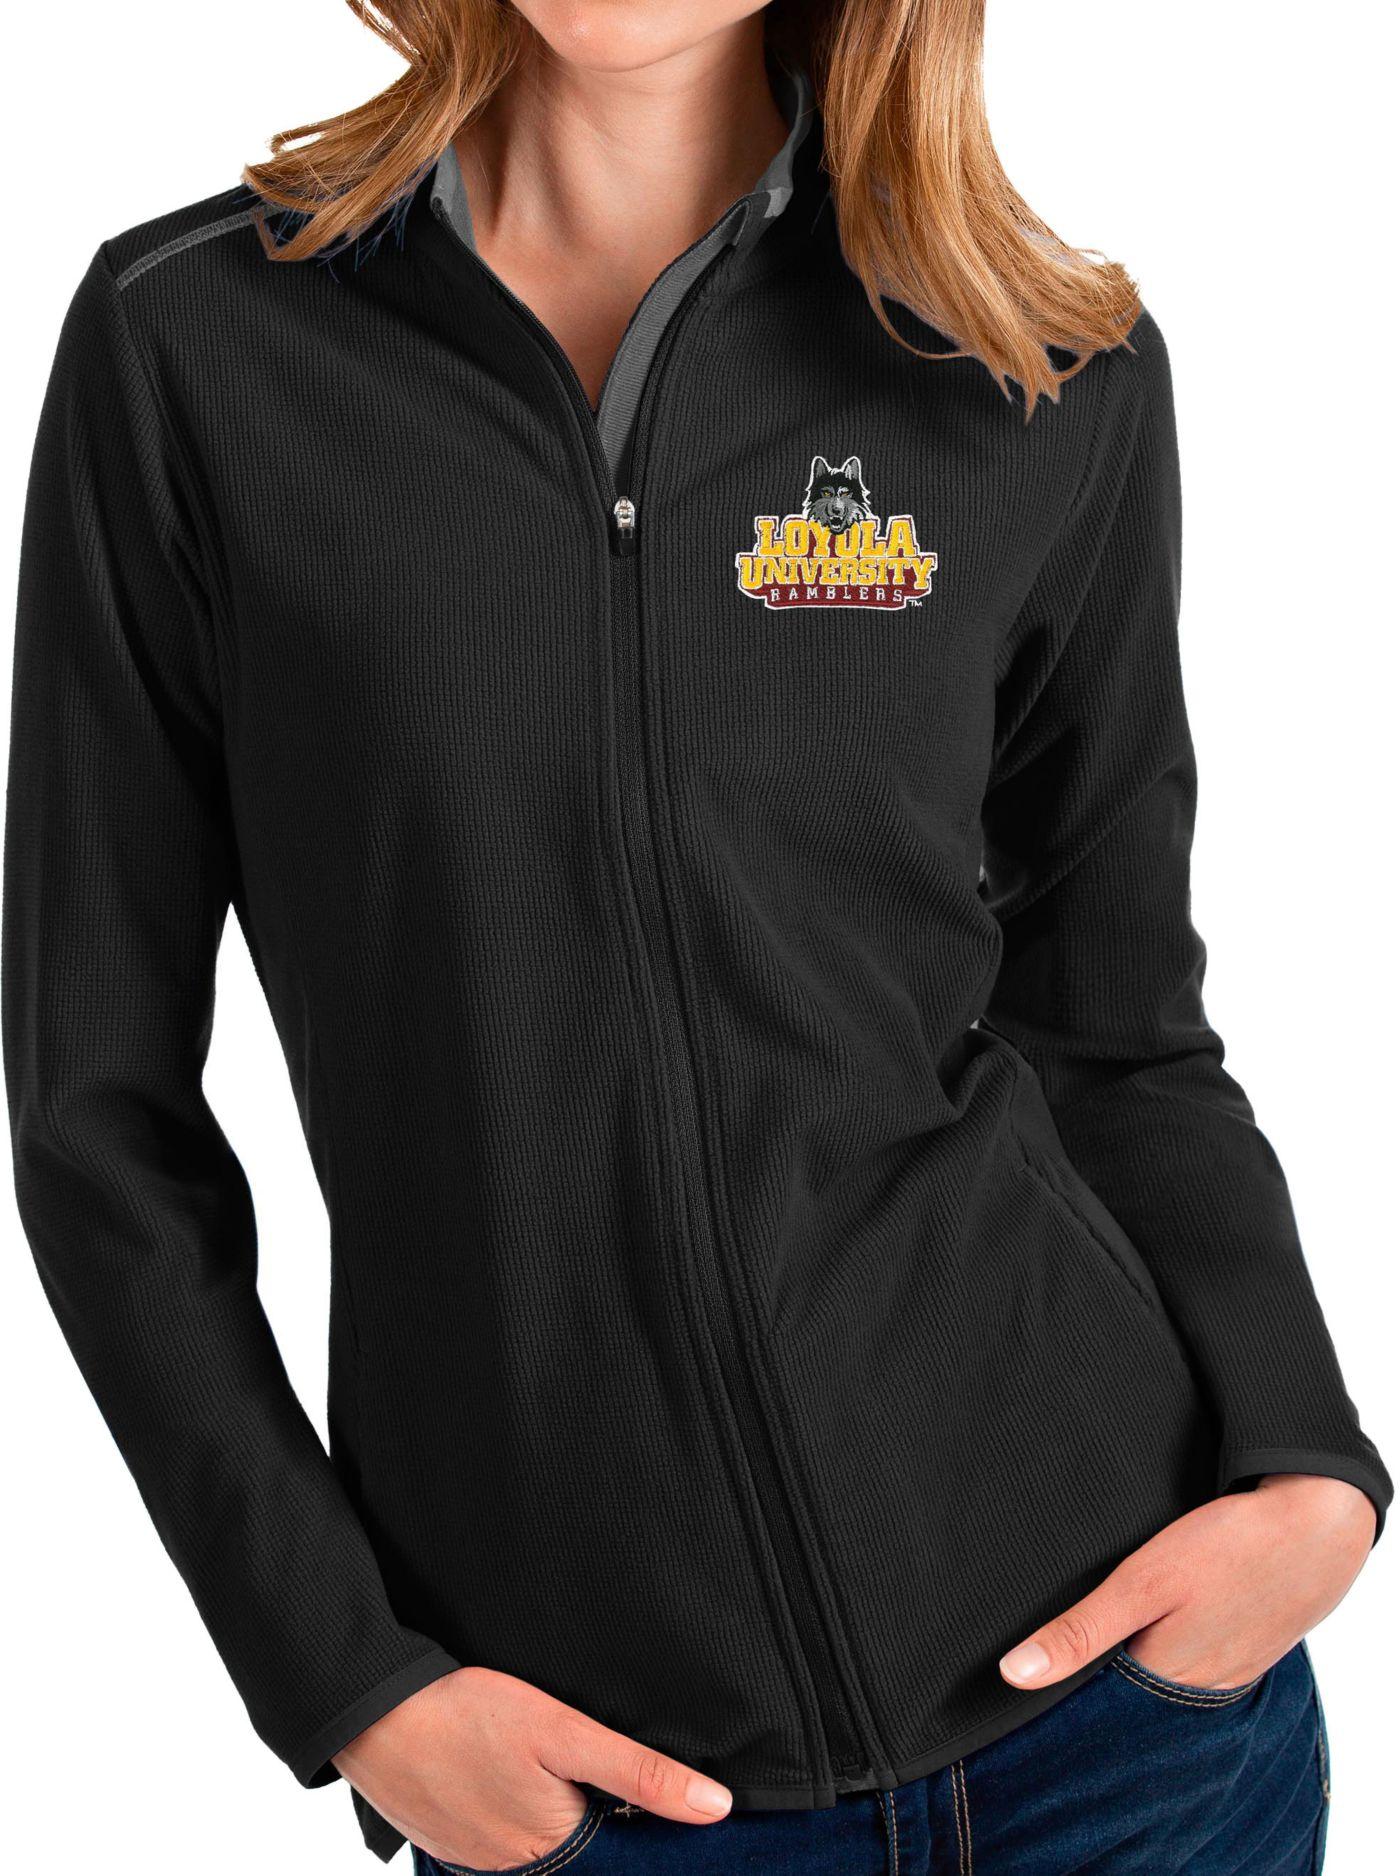 Antigua Women's Loyola-Chicago Ramblers Glacier Full-Zip Black Jacket